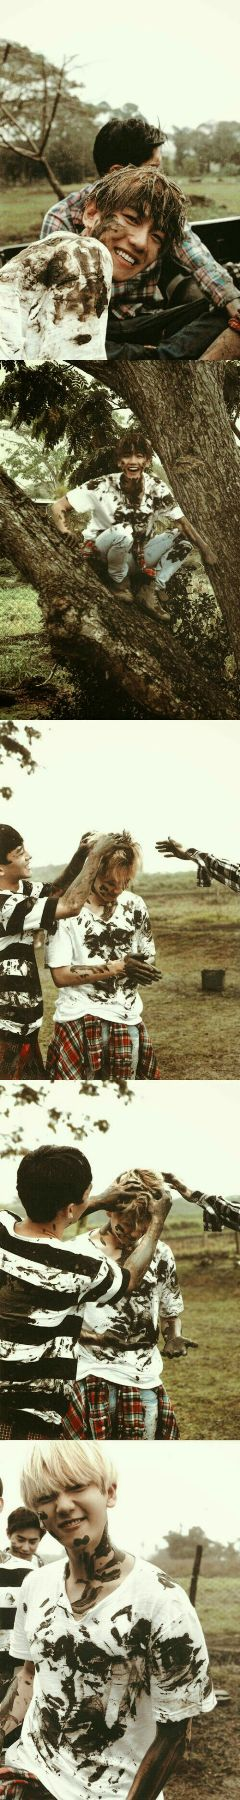 exo kpop perfect cute mud